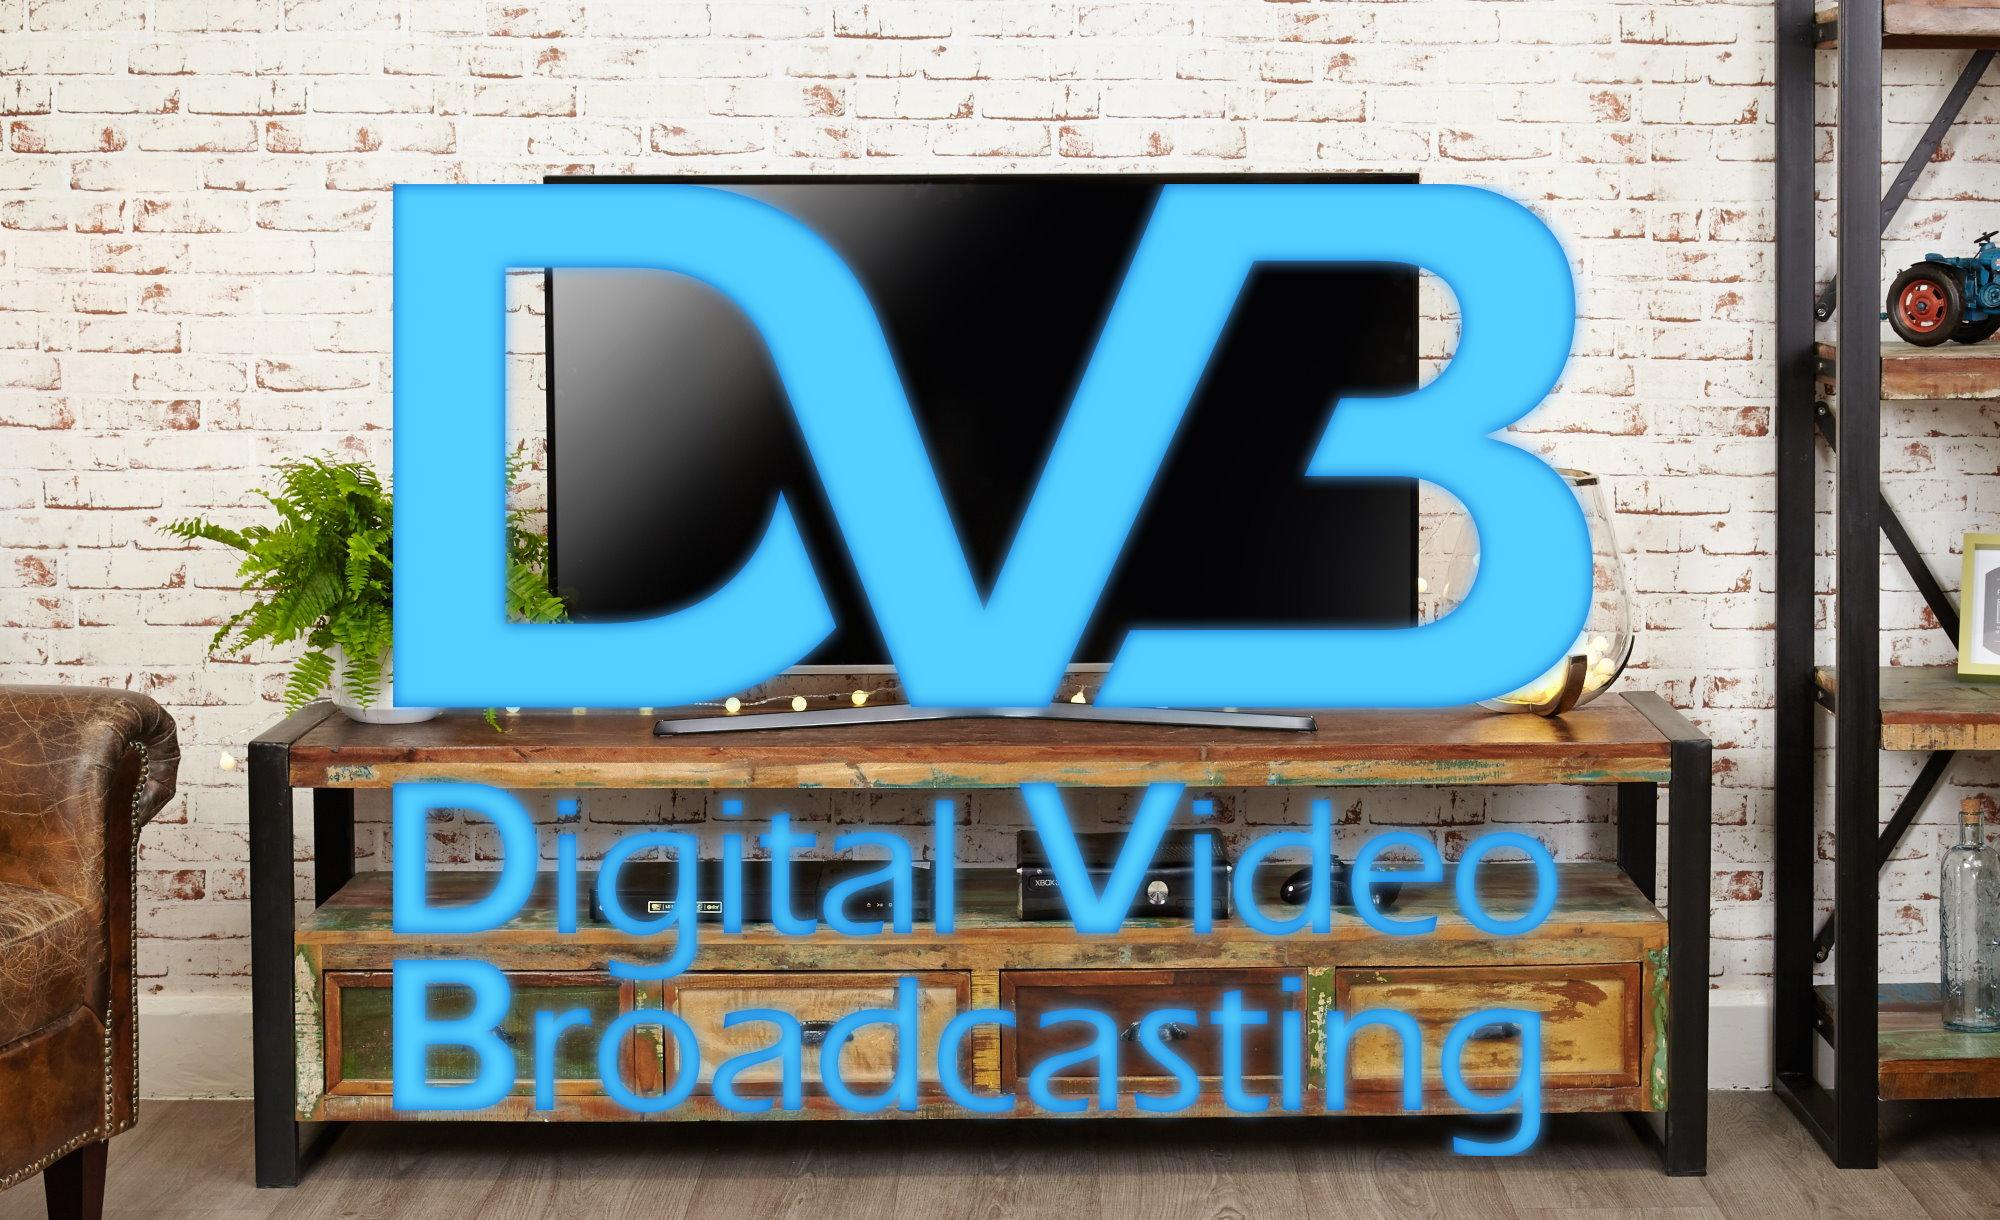 DVB Project / DVB Group / The Digital Video Broadcasting Project (DVB)